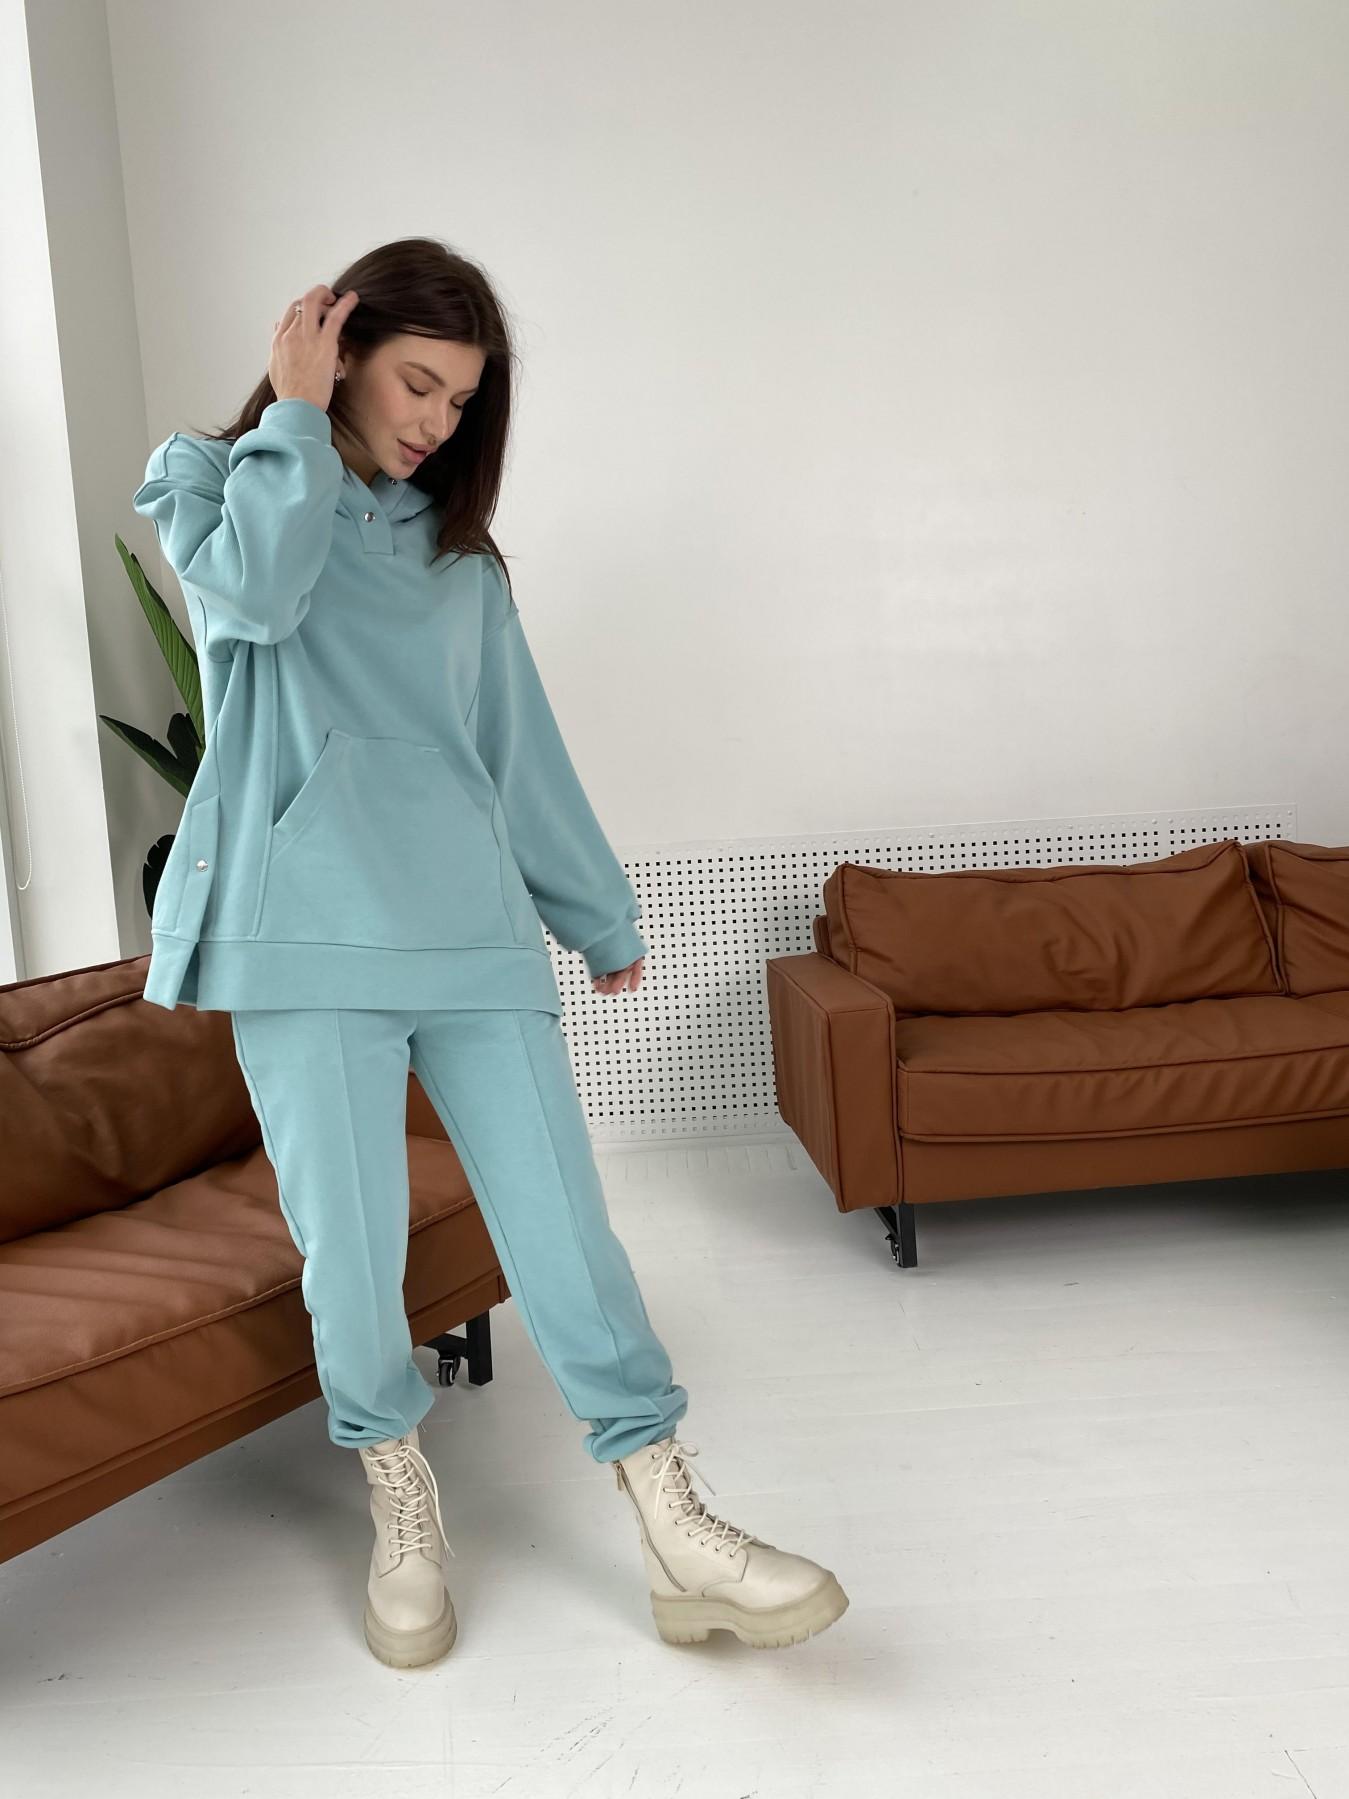 Лайф костюм  из 3х нитки 10782 АРТ. 47205 Цвет: Олива - фото 5, интернет магазин tm-modus.ru